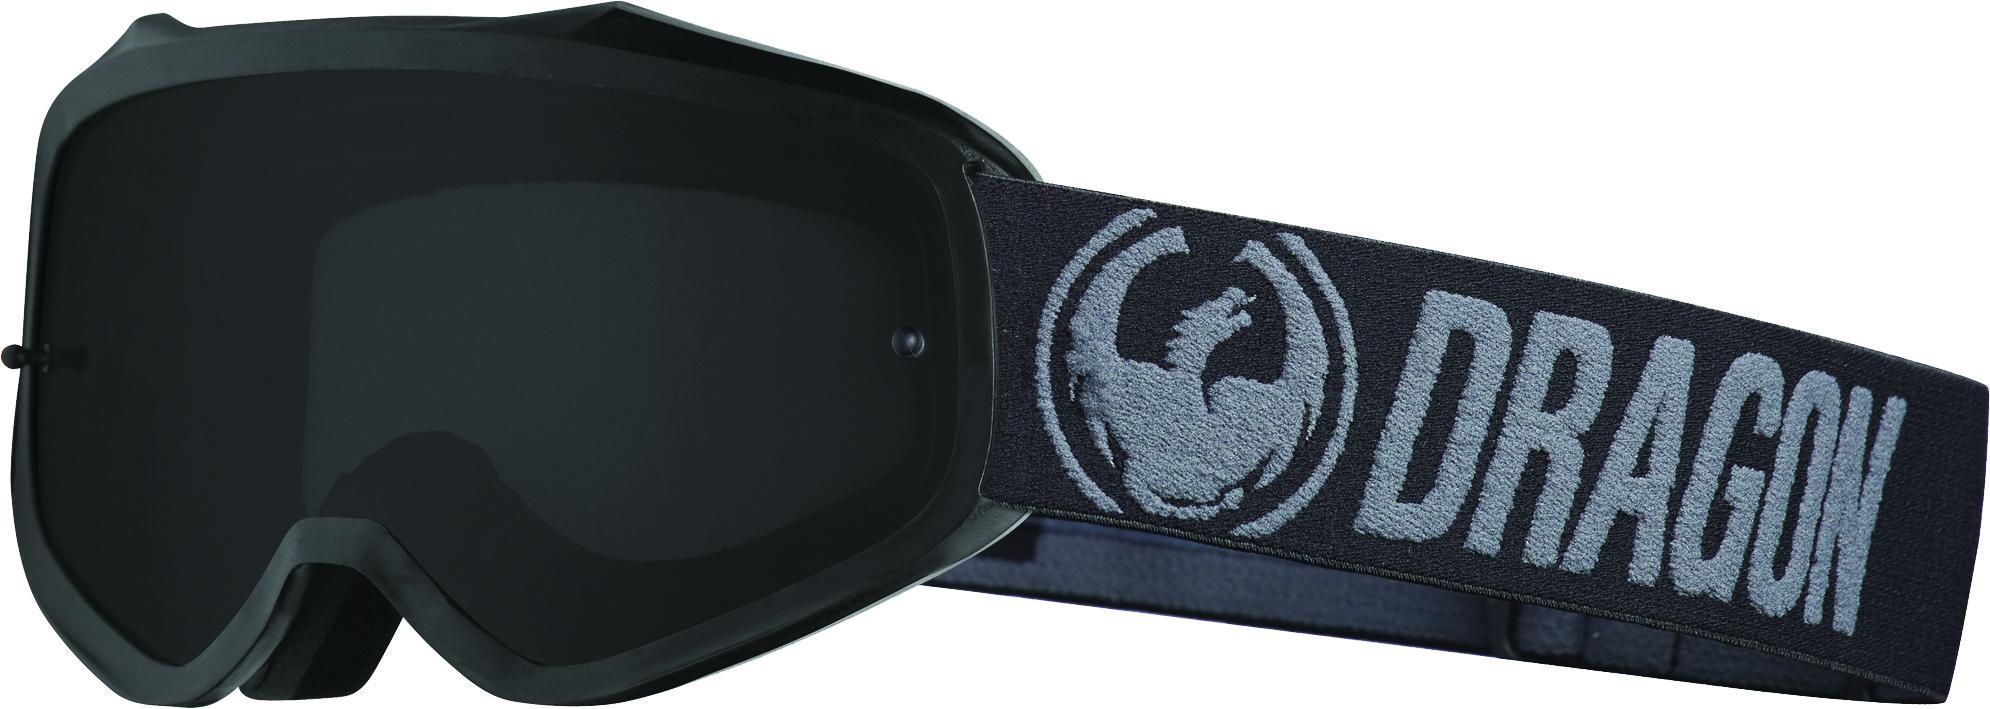 Mxv Goggle Black W/Smoke Lens